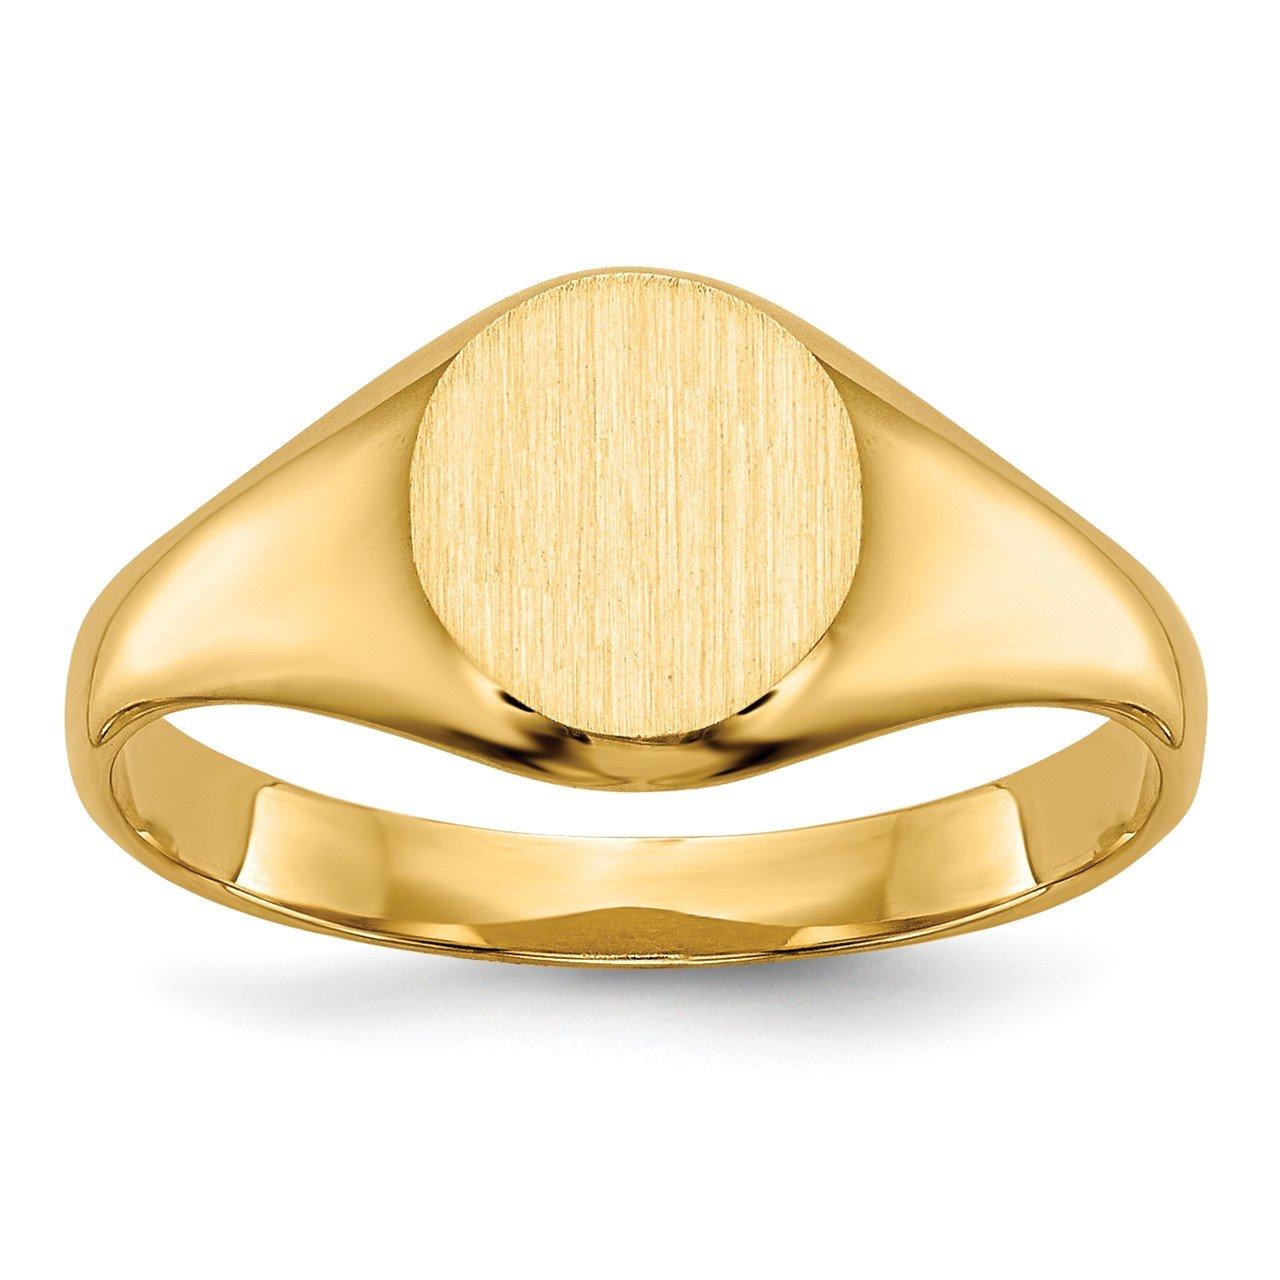 14k Childs Signet Ring